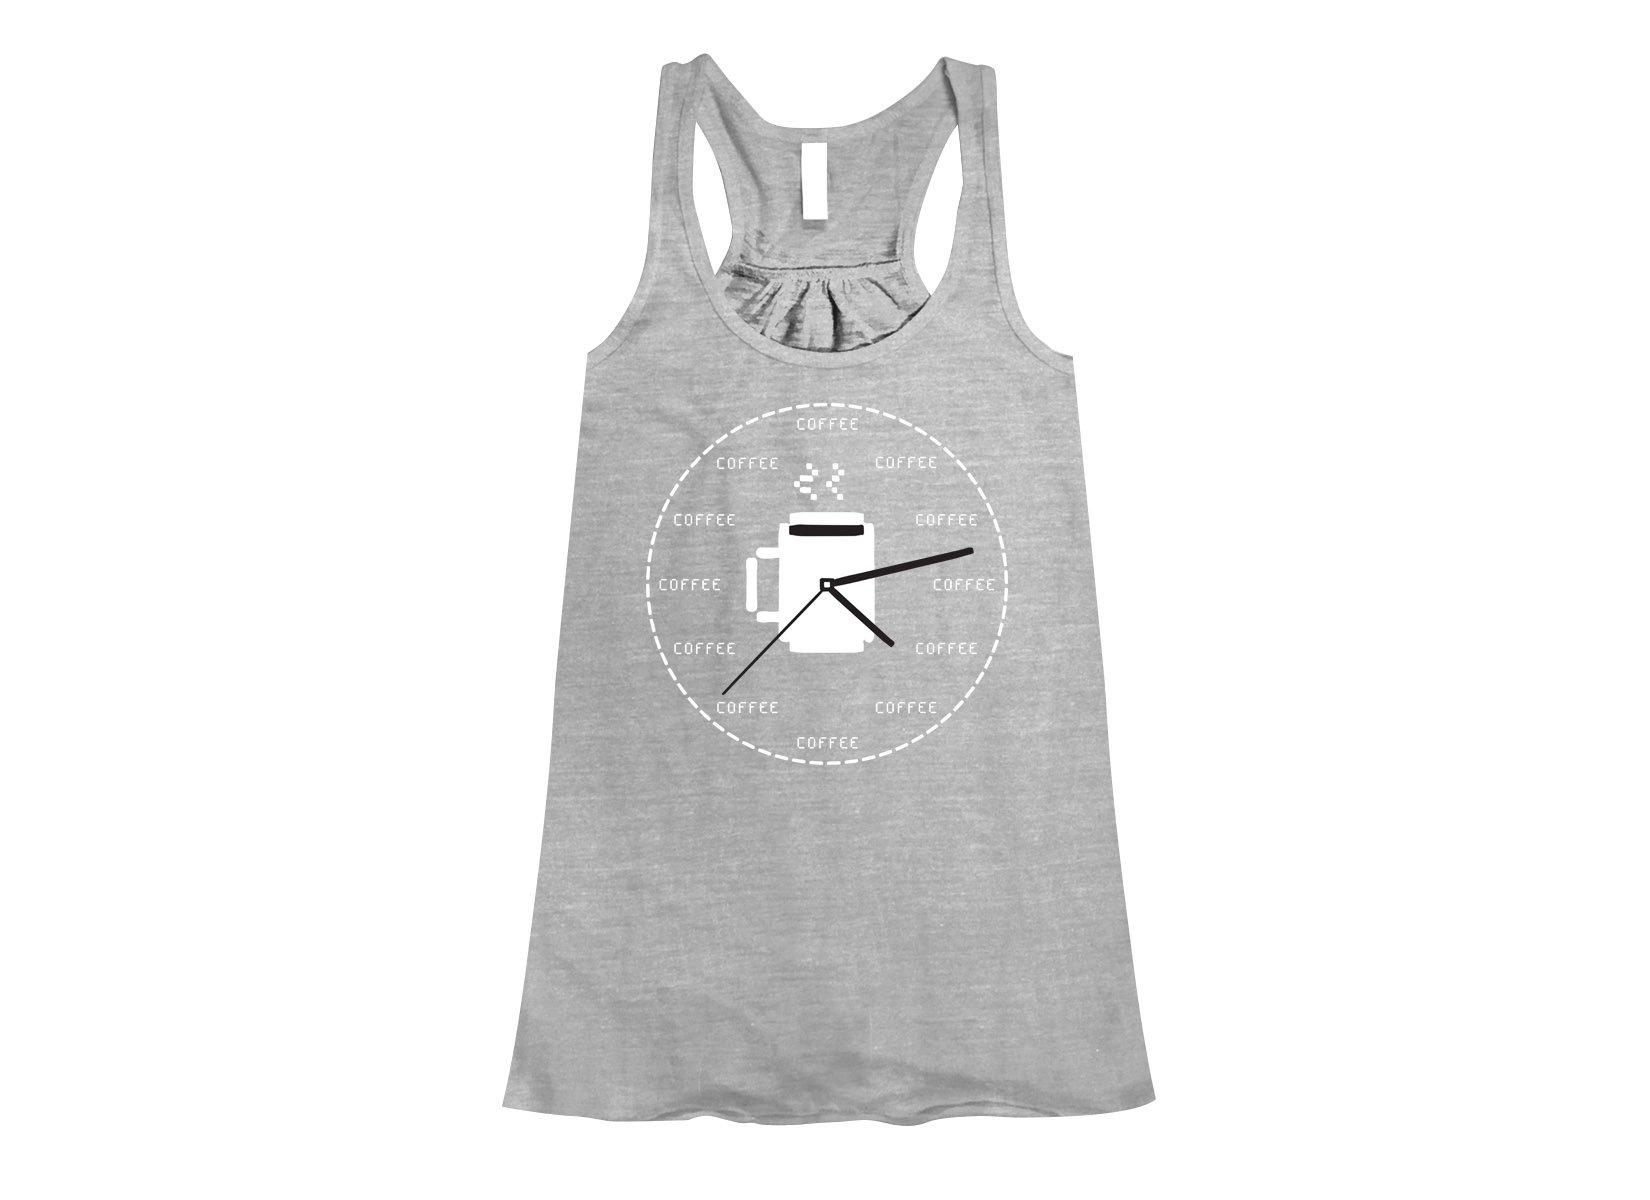 Coffee O'Clock on Womens Tanks T-Shirt